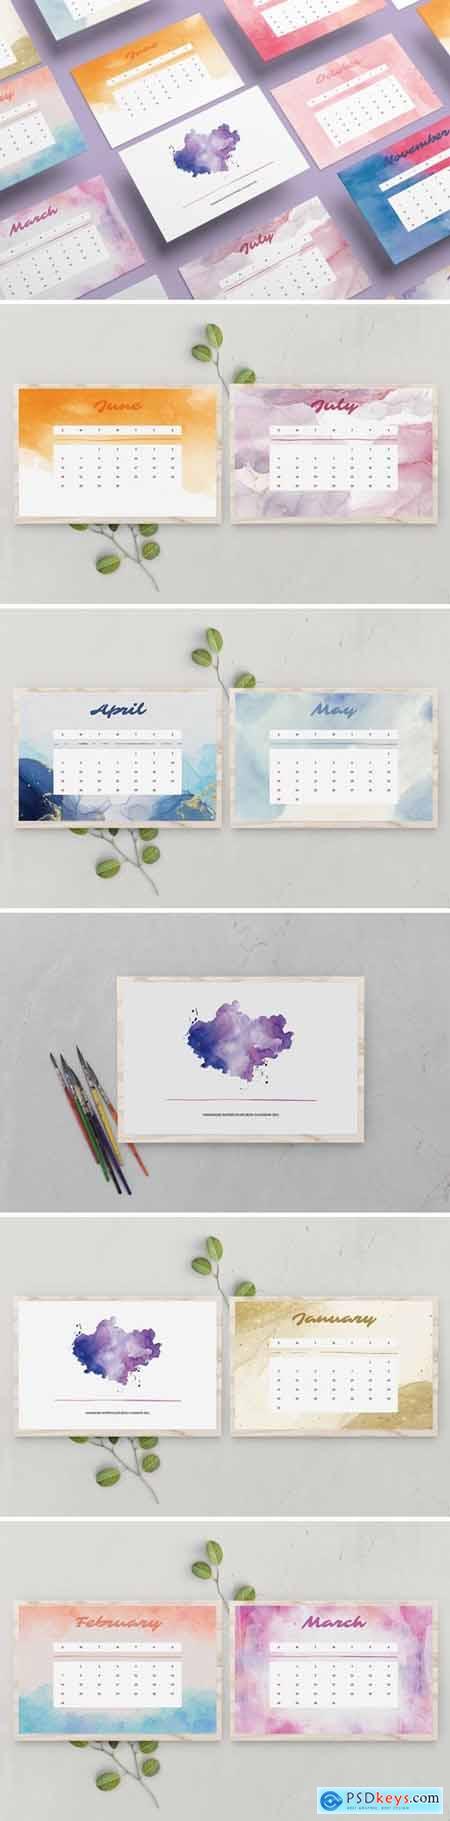 Handmade Watercolor Calendar 2021